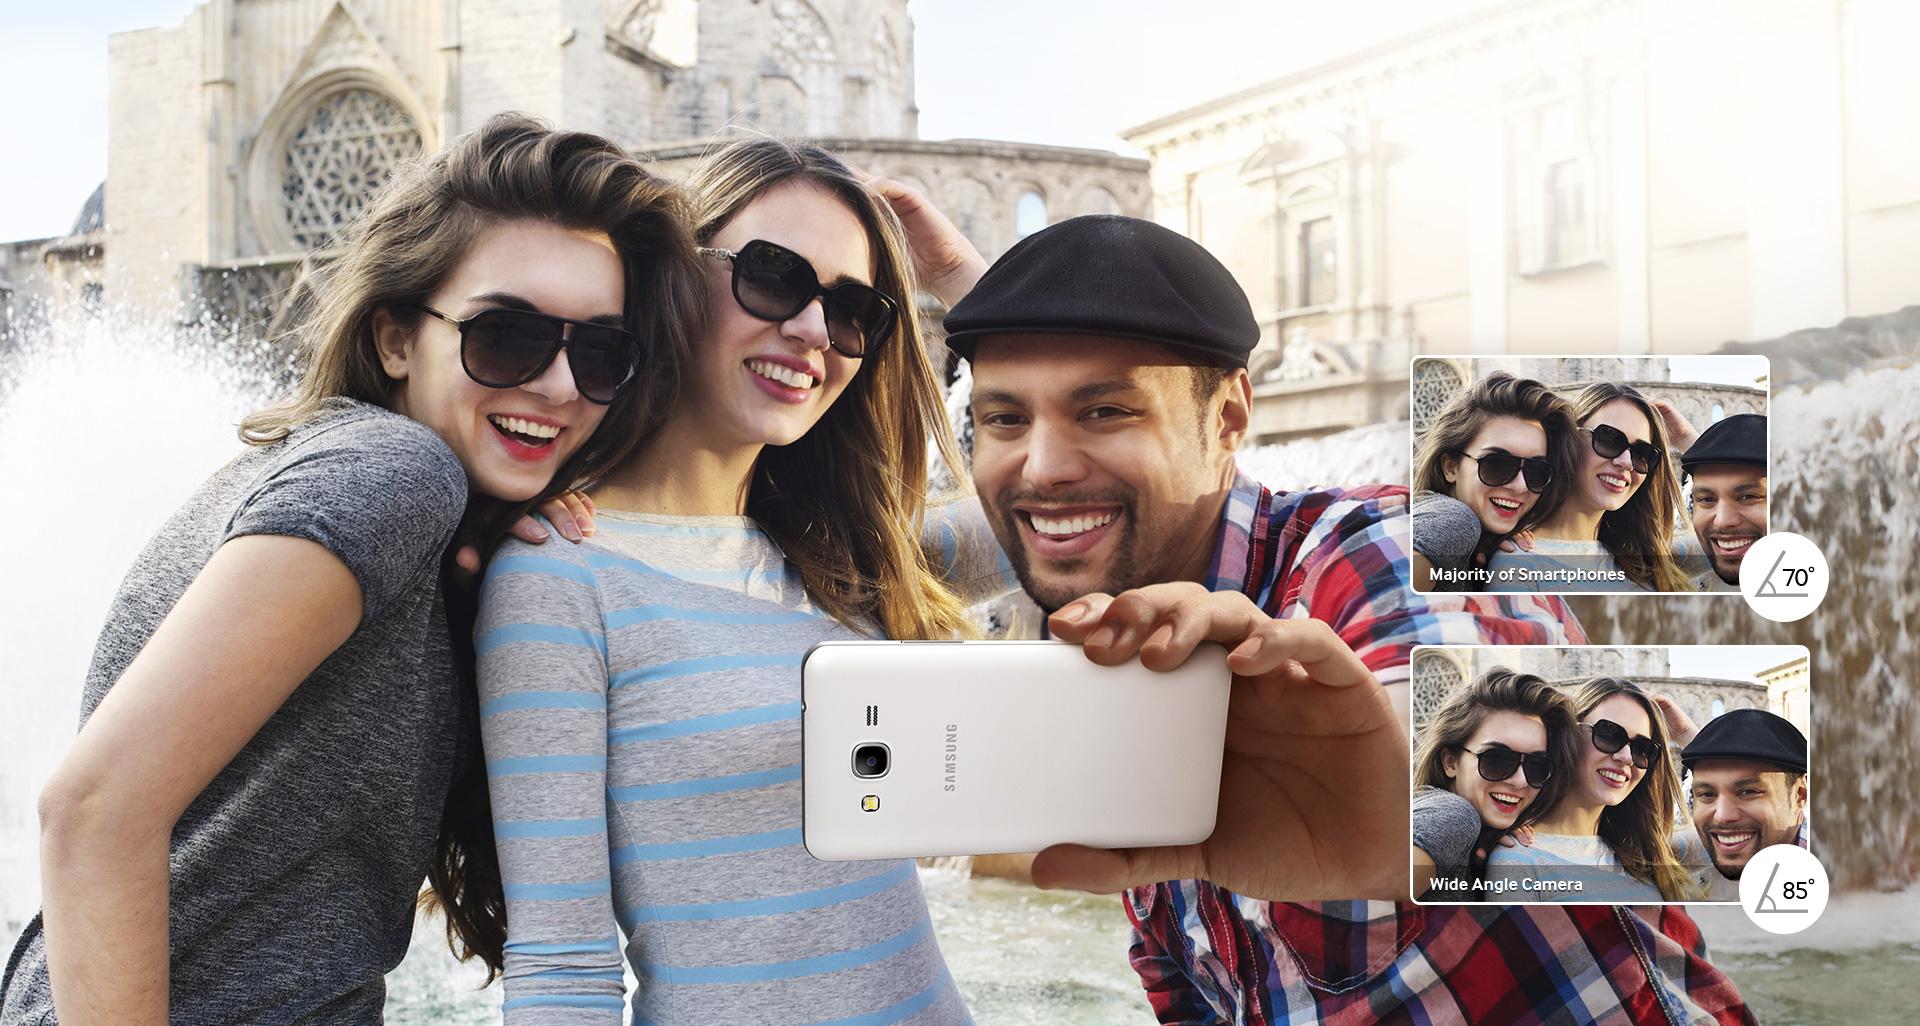 Samsung Galaxy Grand Prime foto Selfie Grupal Groupfie